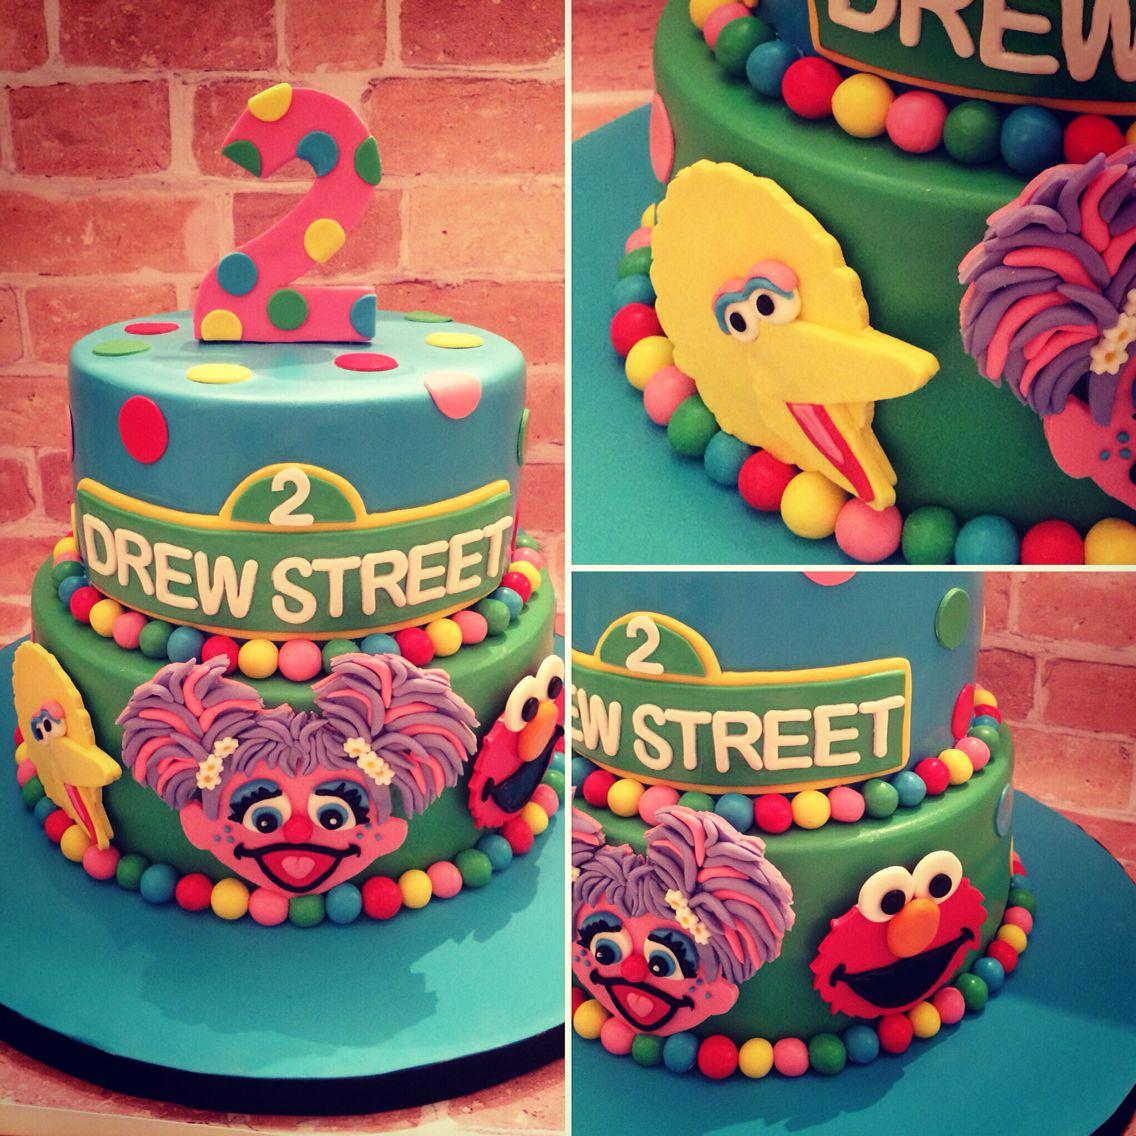 Sesame Street Themed Cake For A 2yr Old Birthday Girl I Loved